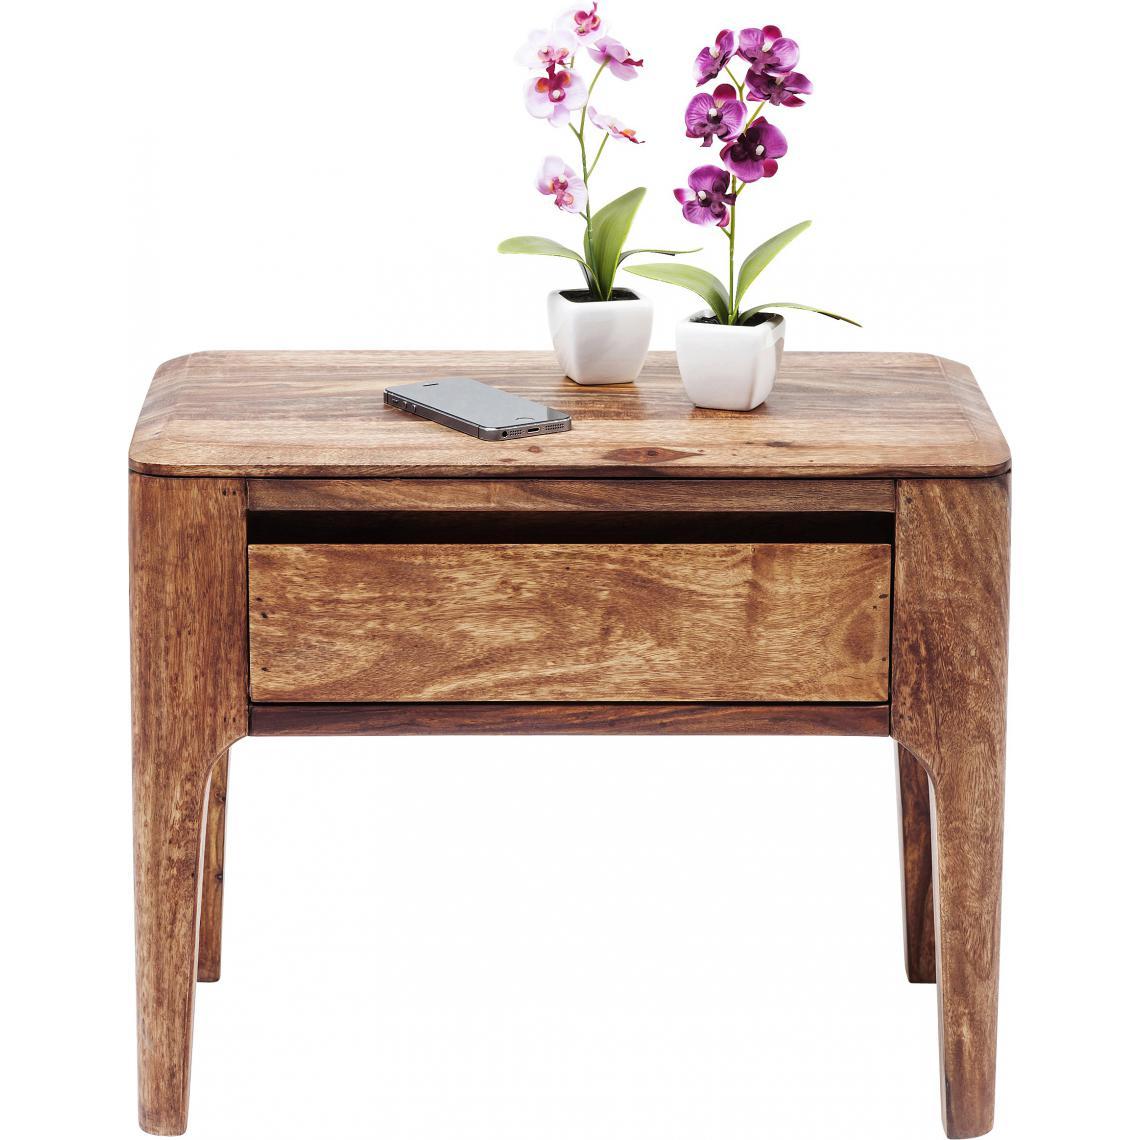 KARE DESIGN Table D'Appoint KARE DESIGN En Bois Effet Vieilli H50 NINON